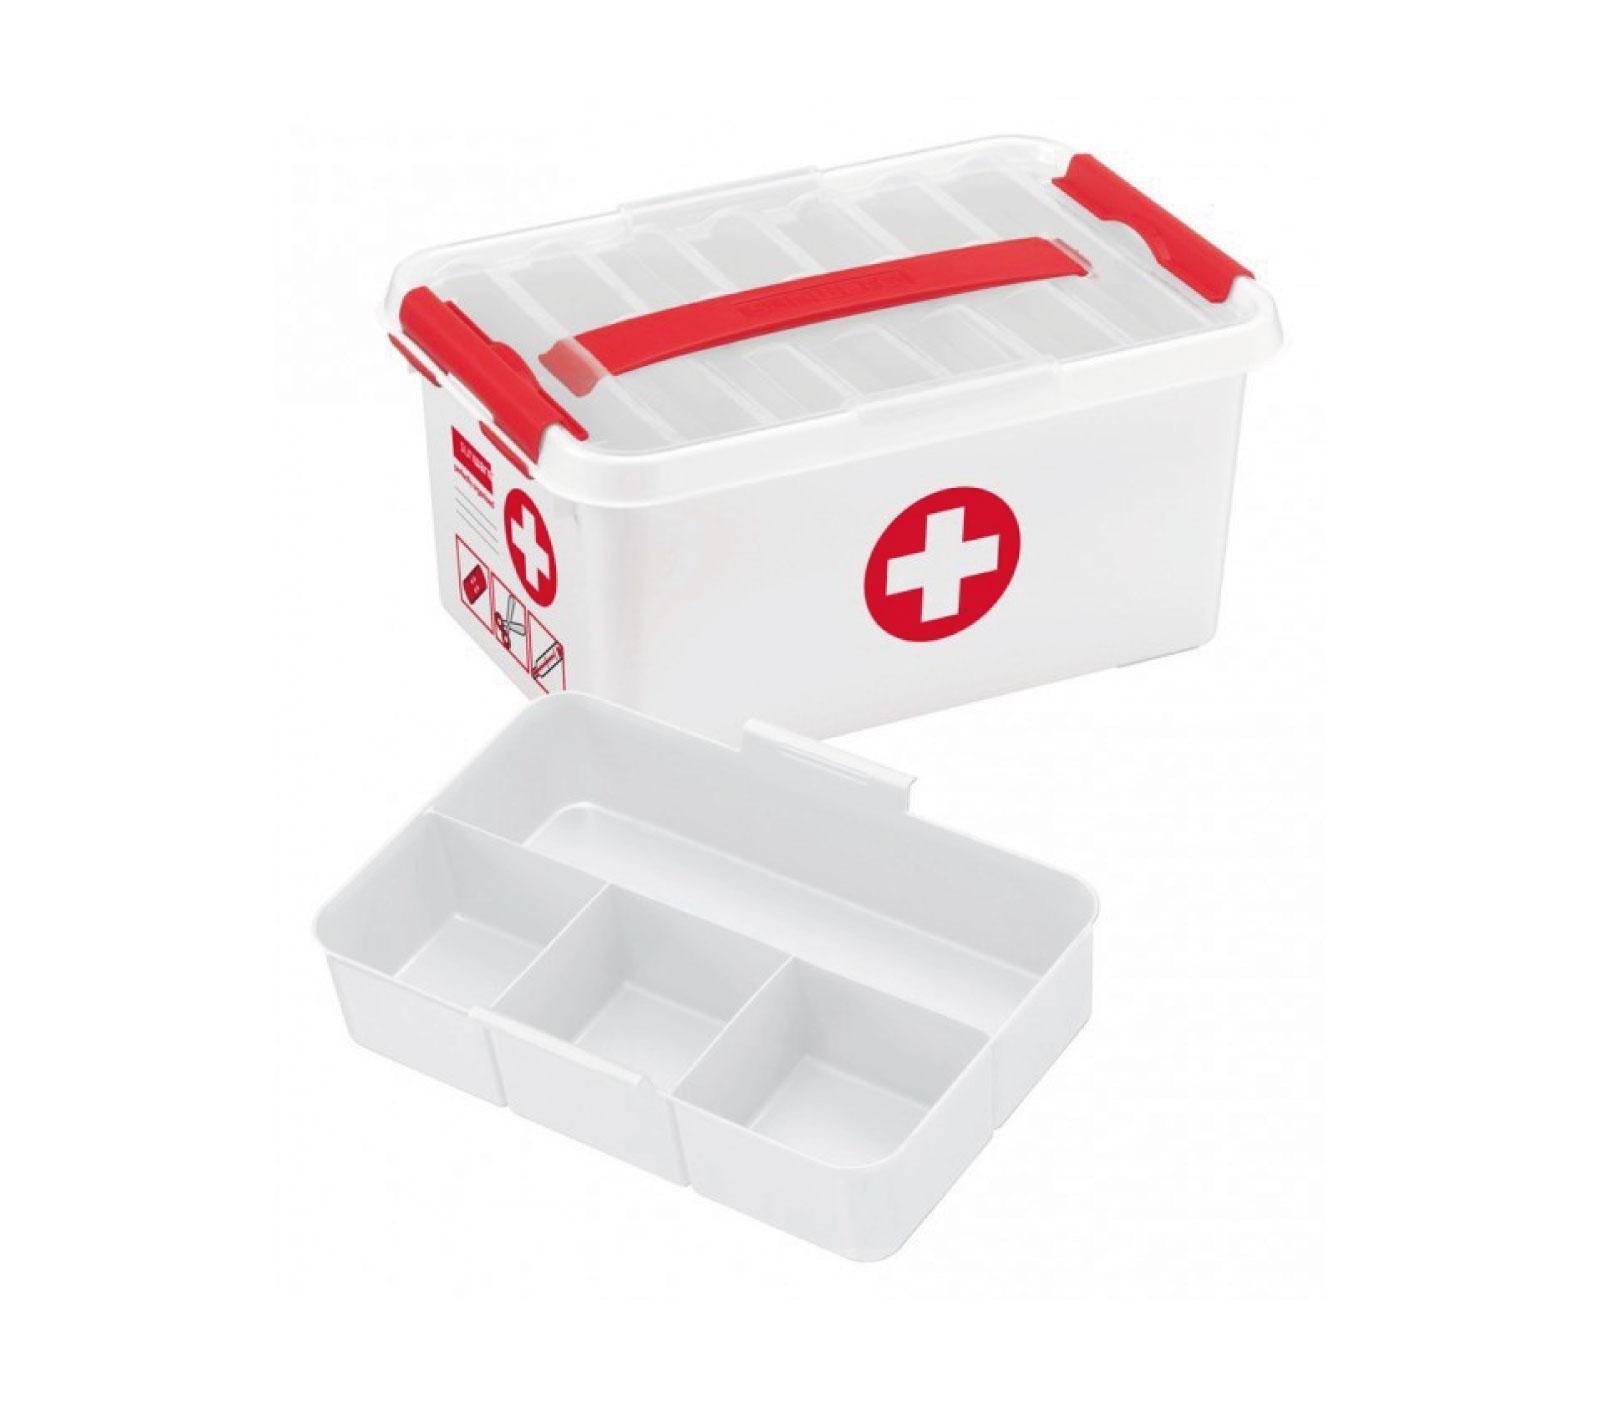 Sunware Q-line Ehbo Box